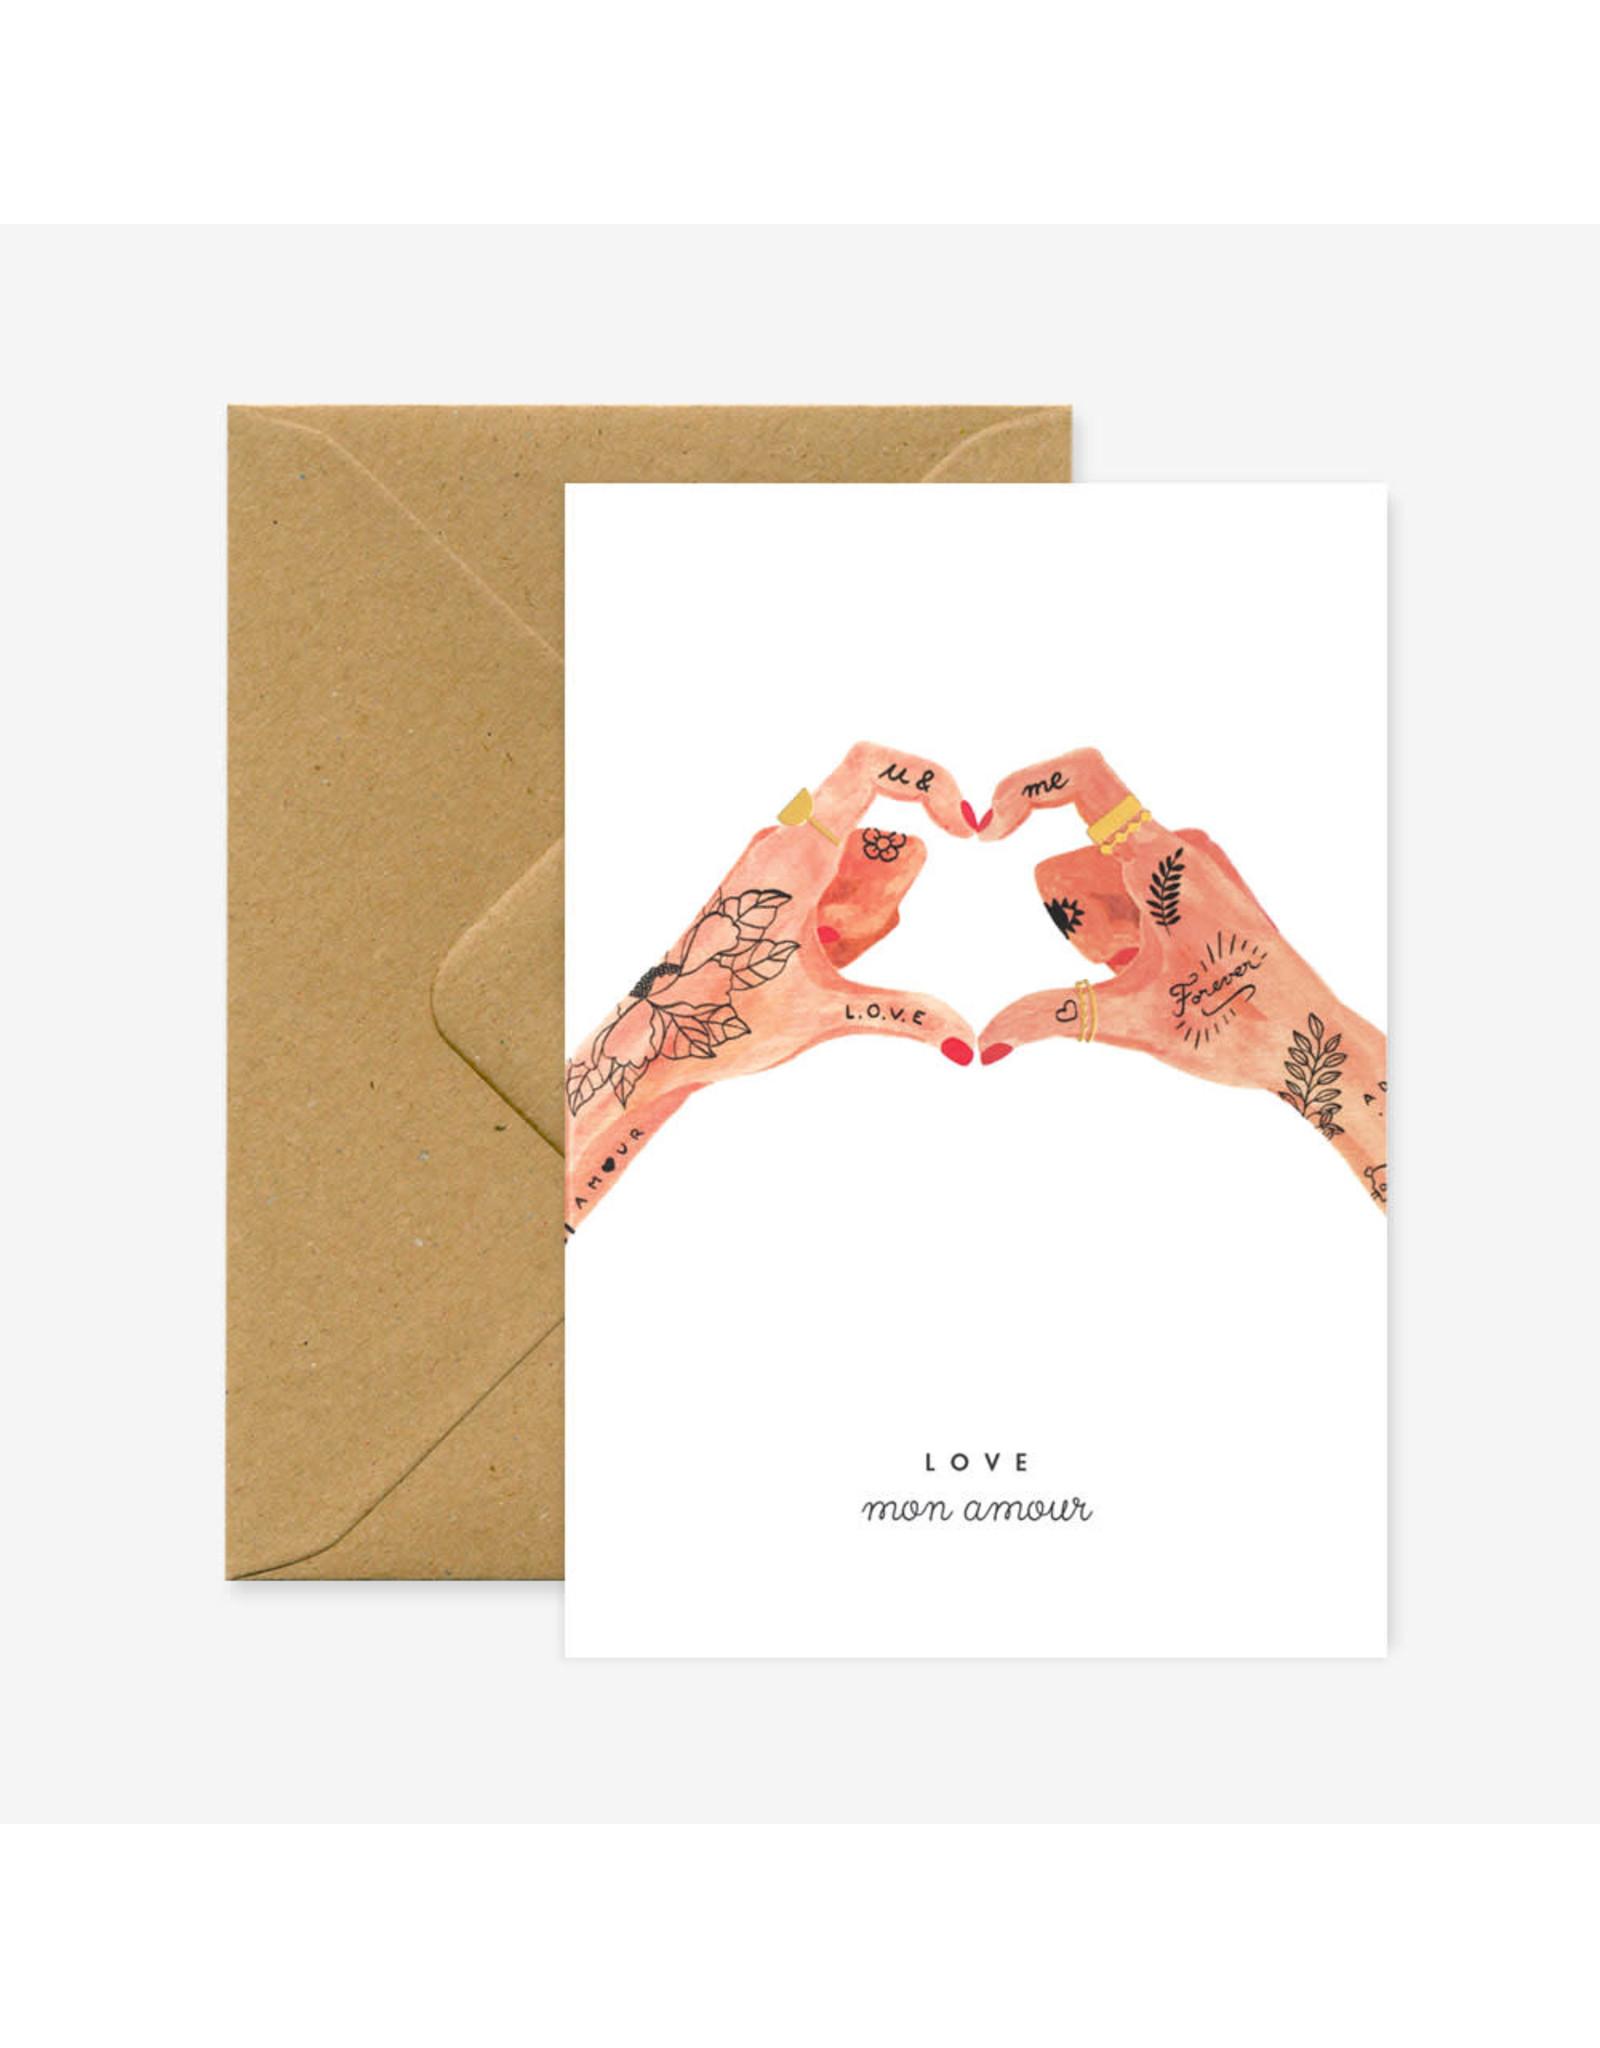 ATWS Wenskaart - Hands of love  - Dubbele kaart + Envelop - 11,5 x 16,5 - Blanco